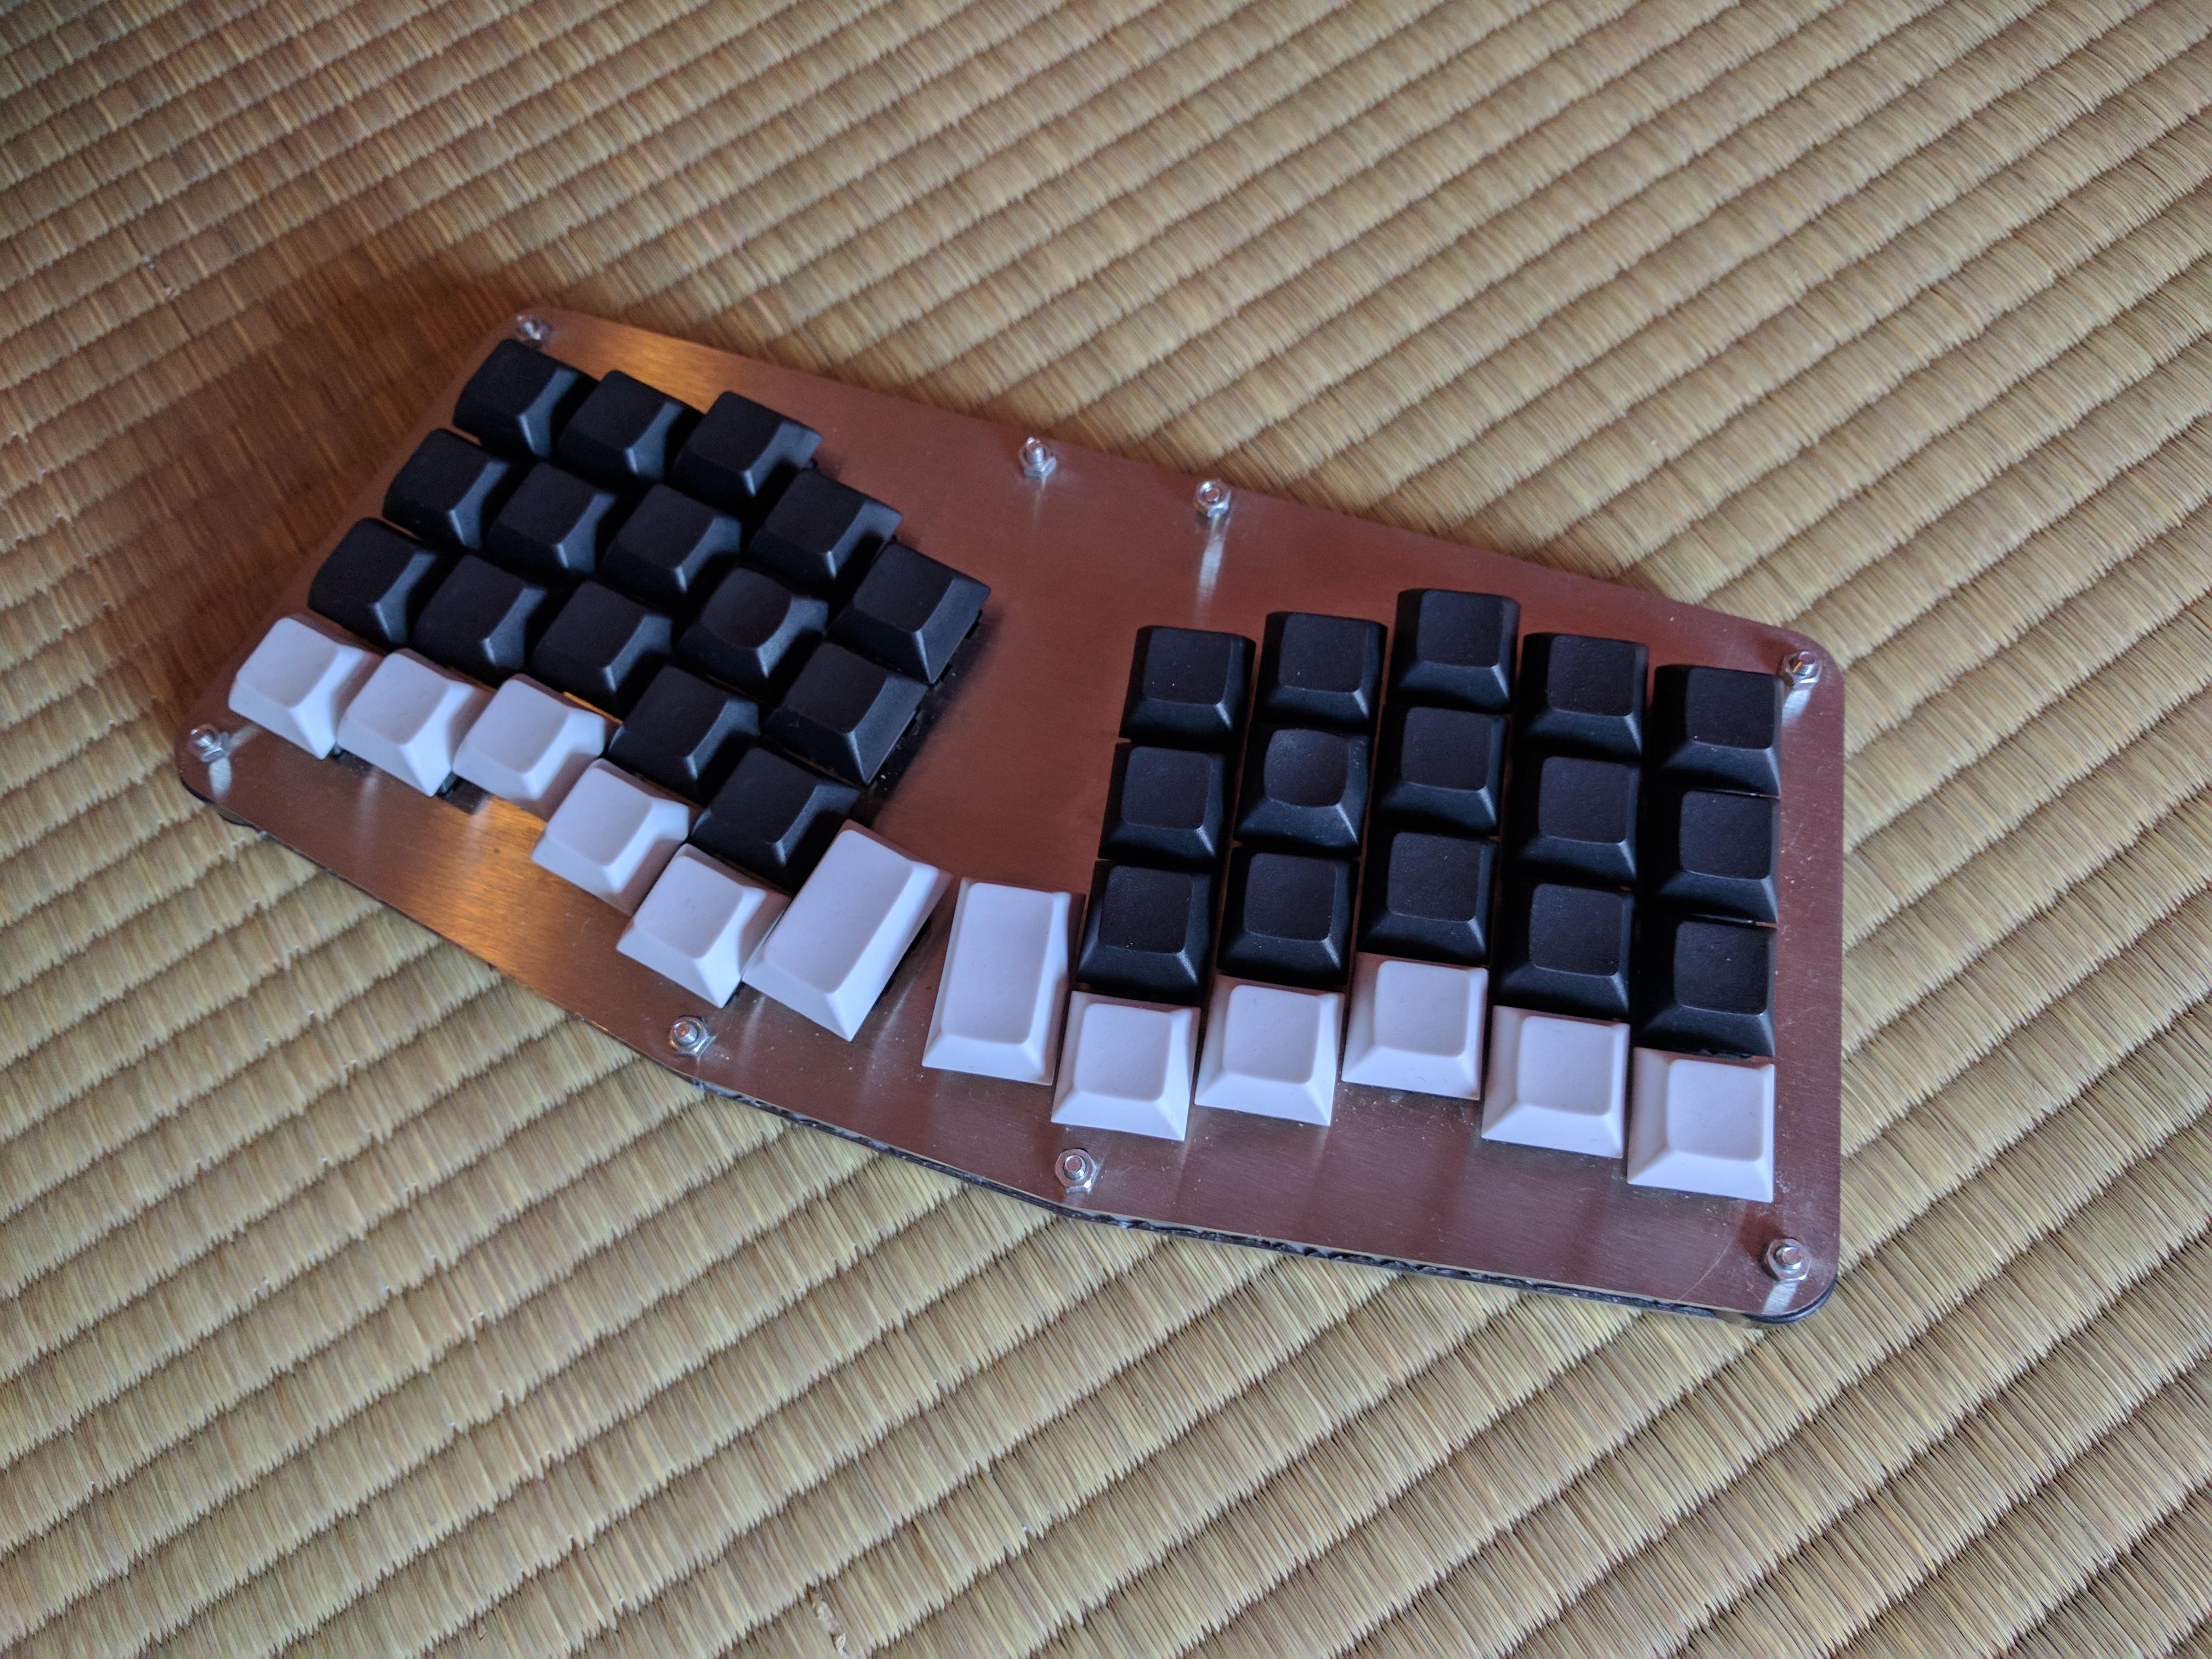 Atreus: Building a custom ergonomic keyboard - Henri Bergius in ...